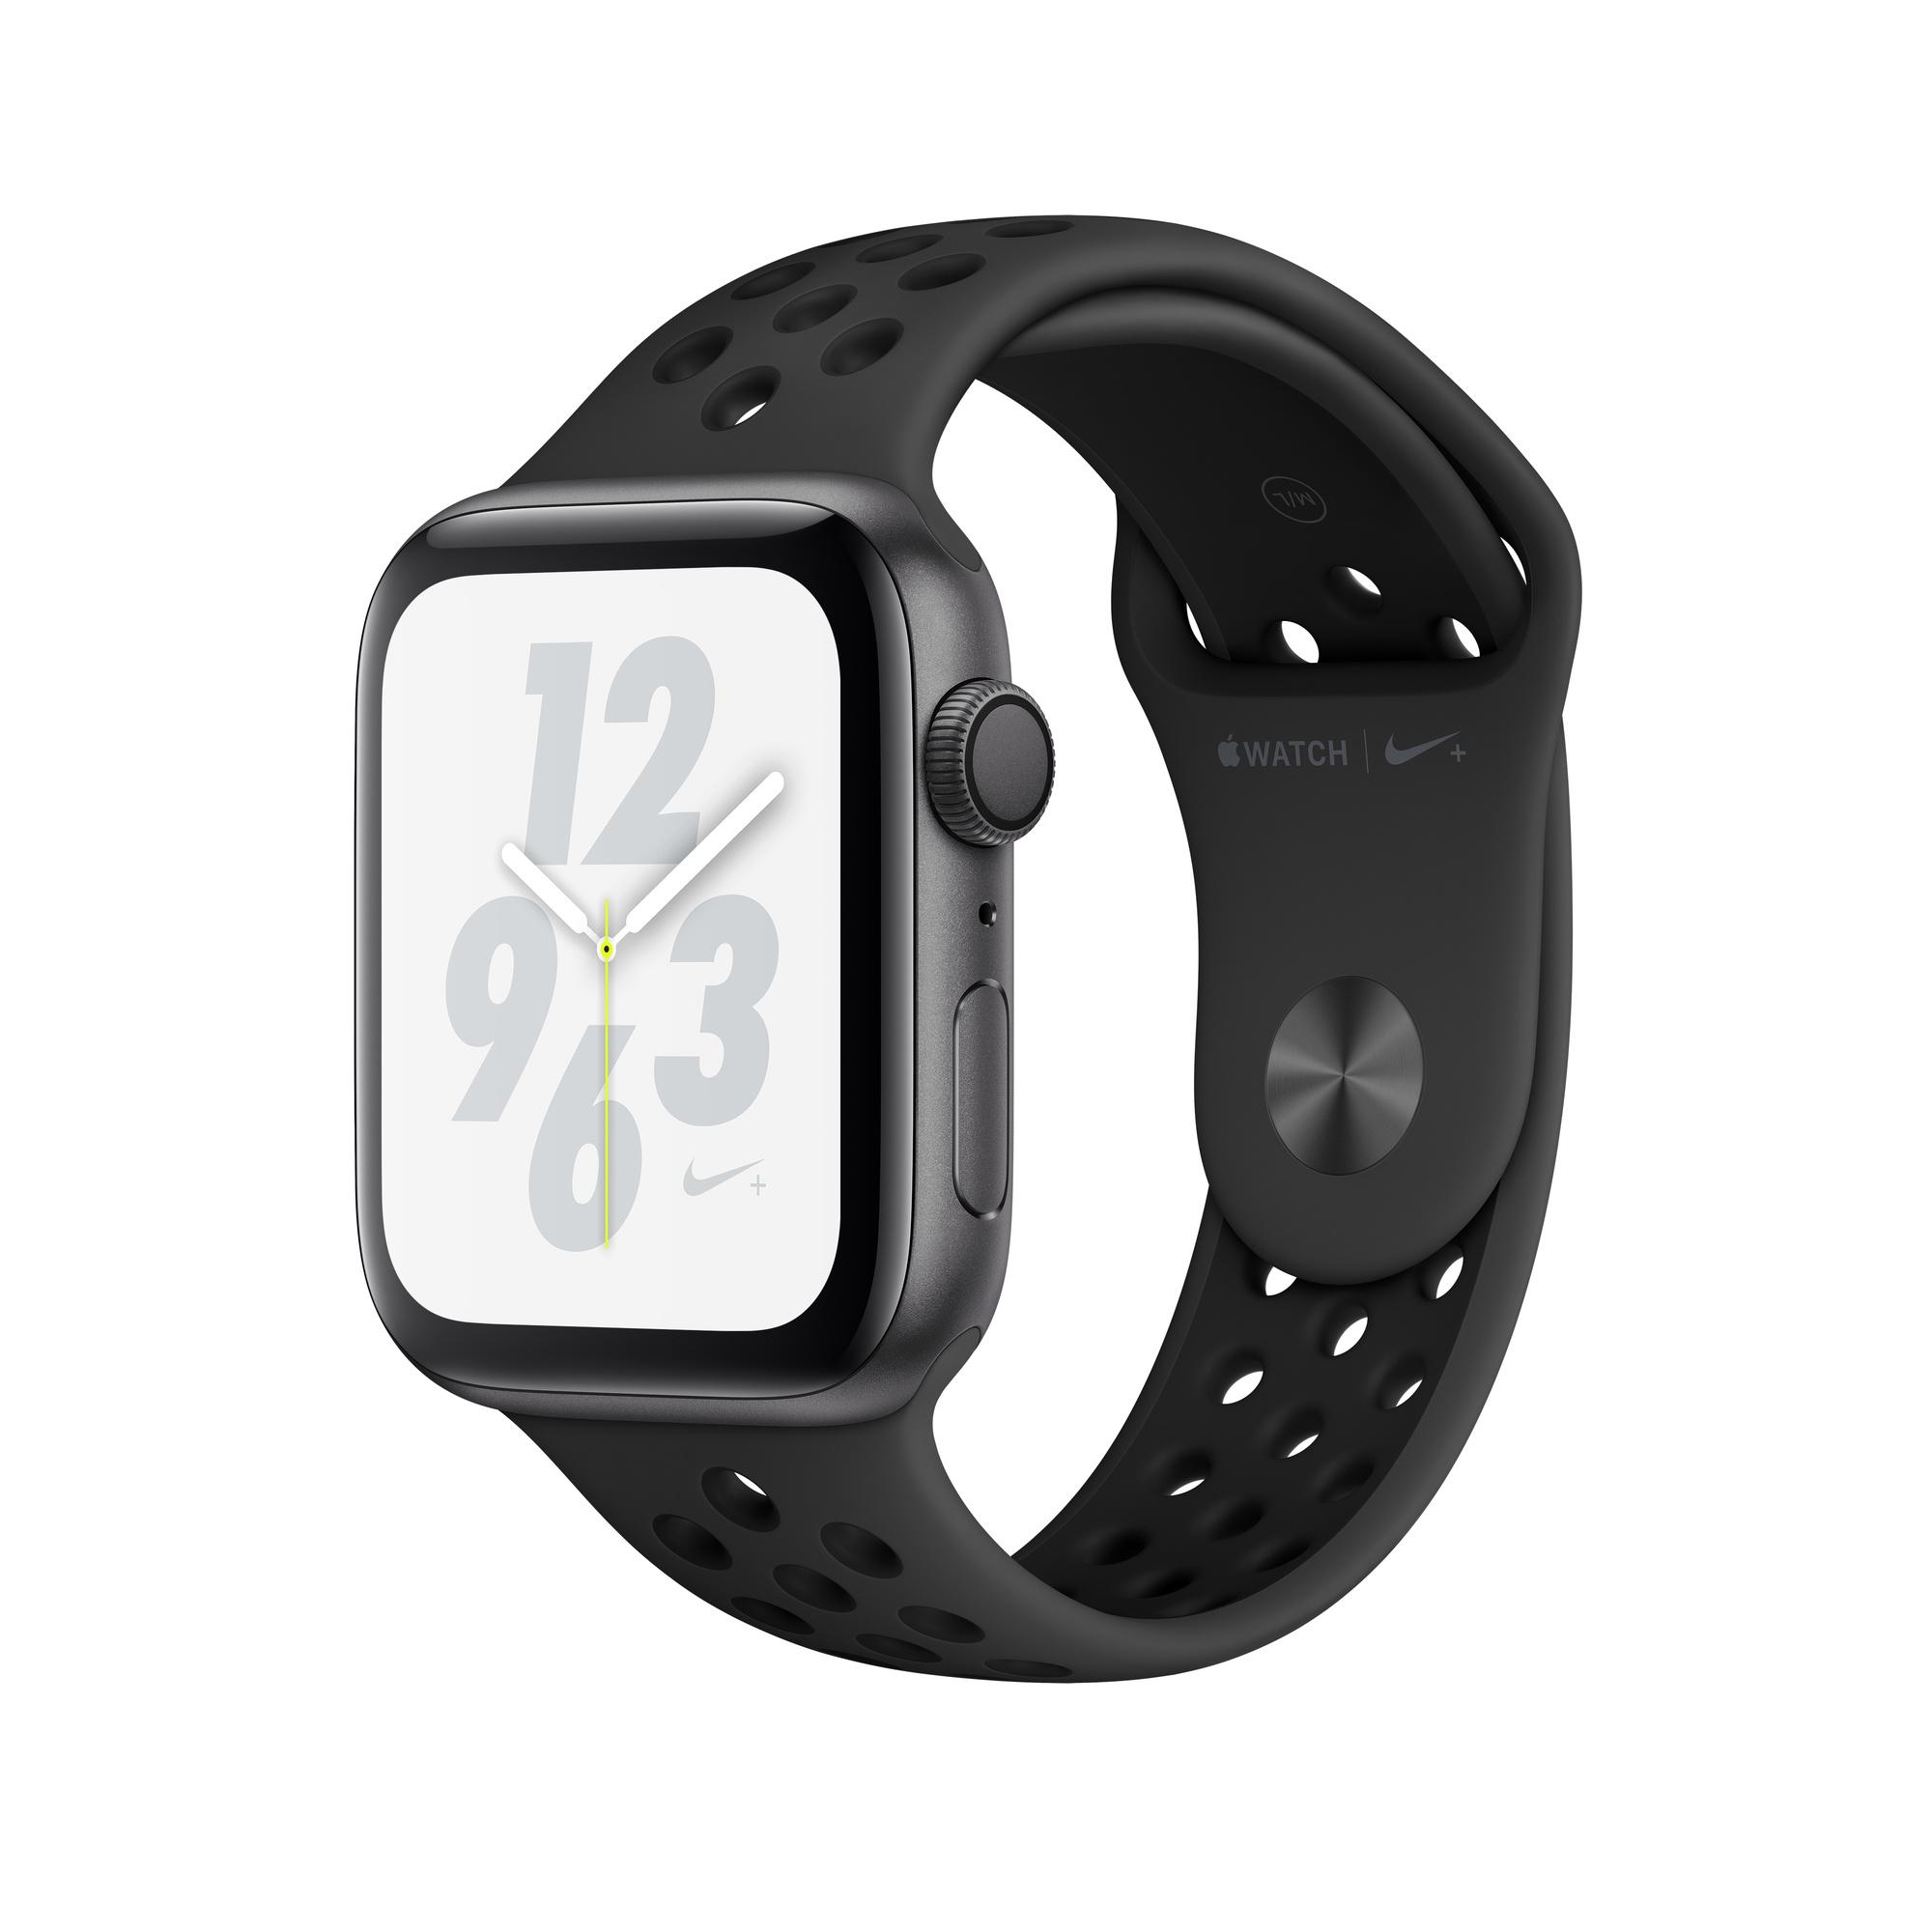 Pompeya Conductividad caldera  Refurbished Apple Watch Nike+ Series 4 GPS, 44mm Space Grey Aluminium Case  with Anthracite/Black Nike Sport Band - Apple (UK)